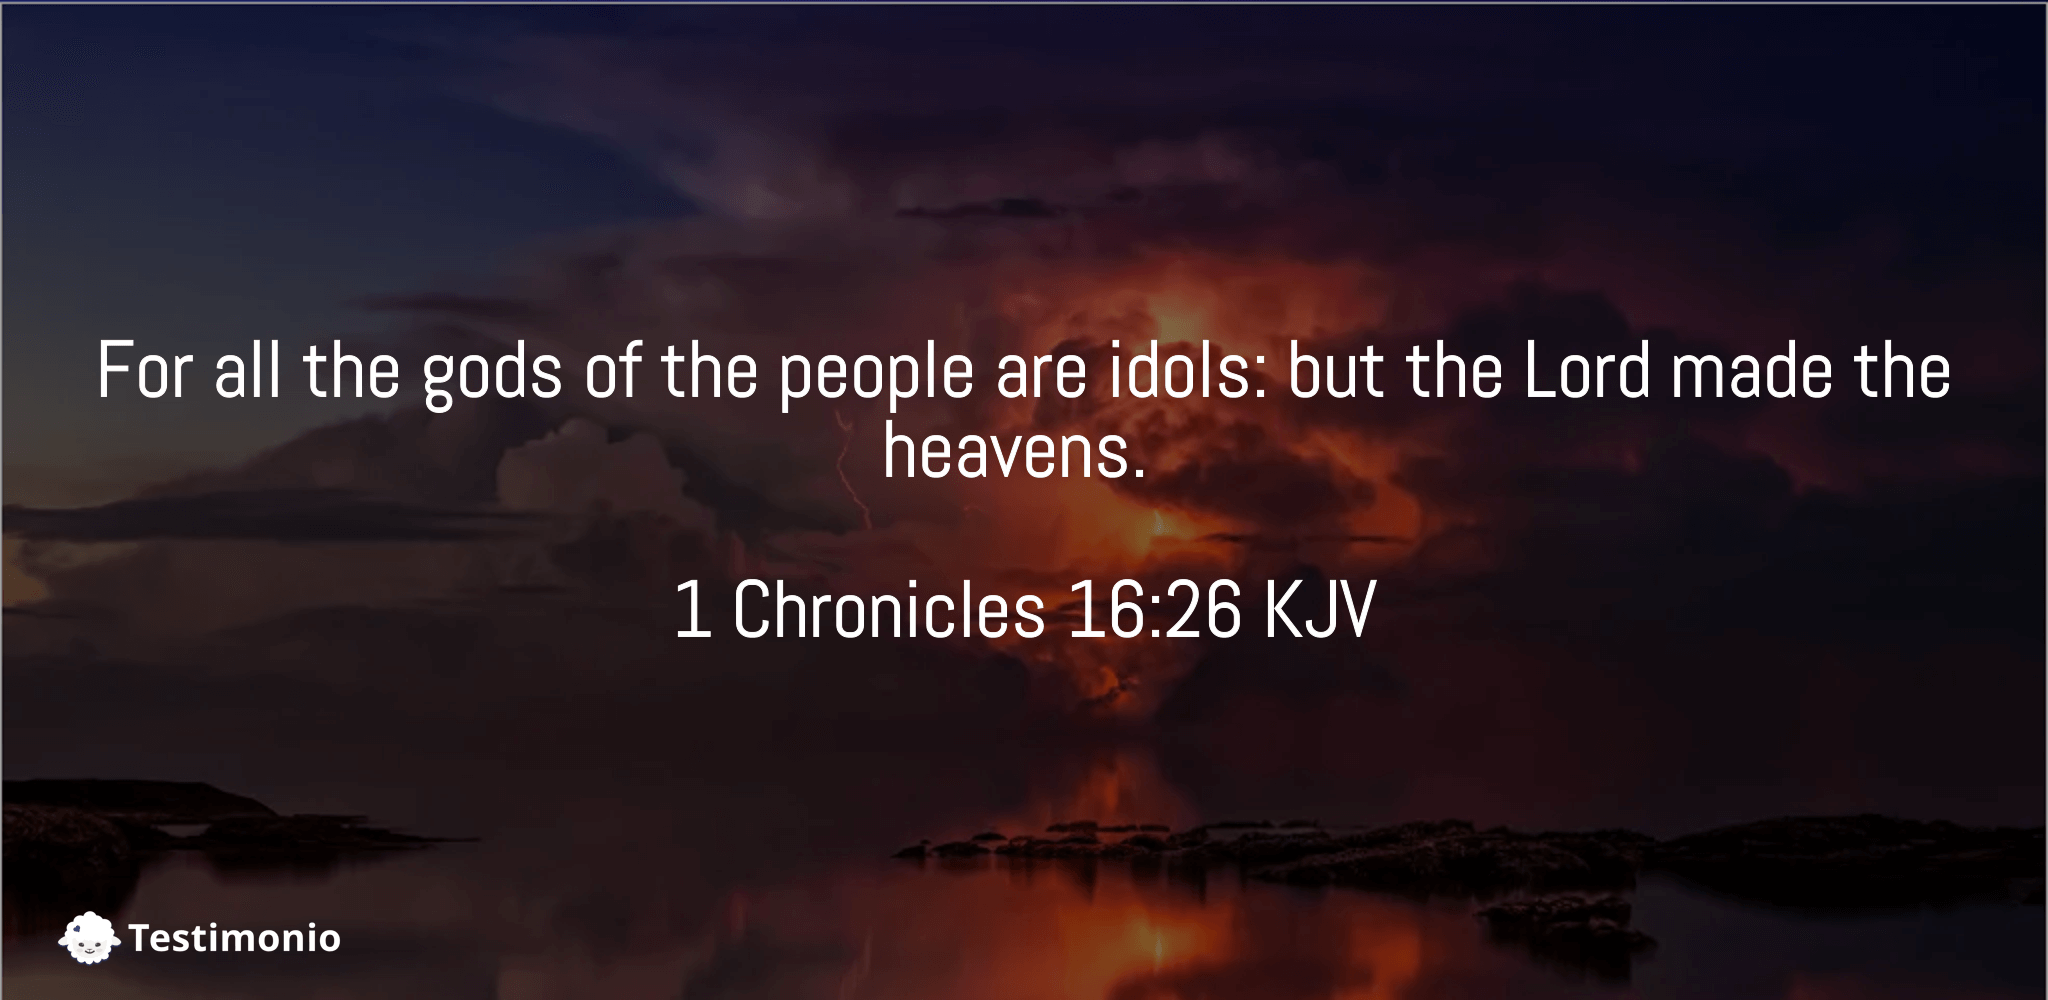 1 Chronicles 16:26